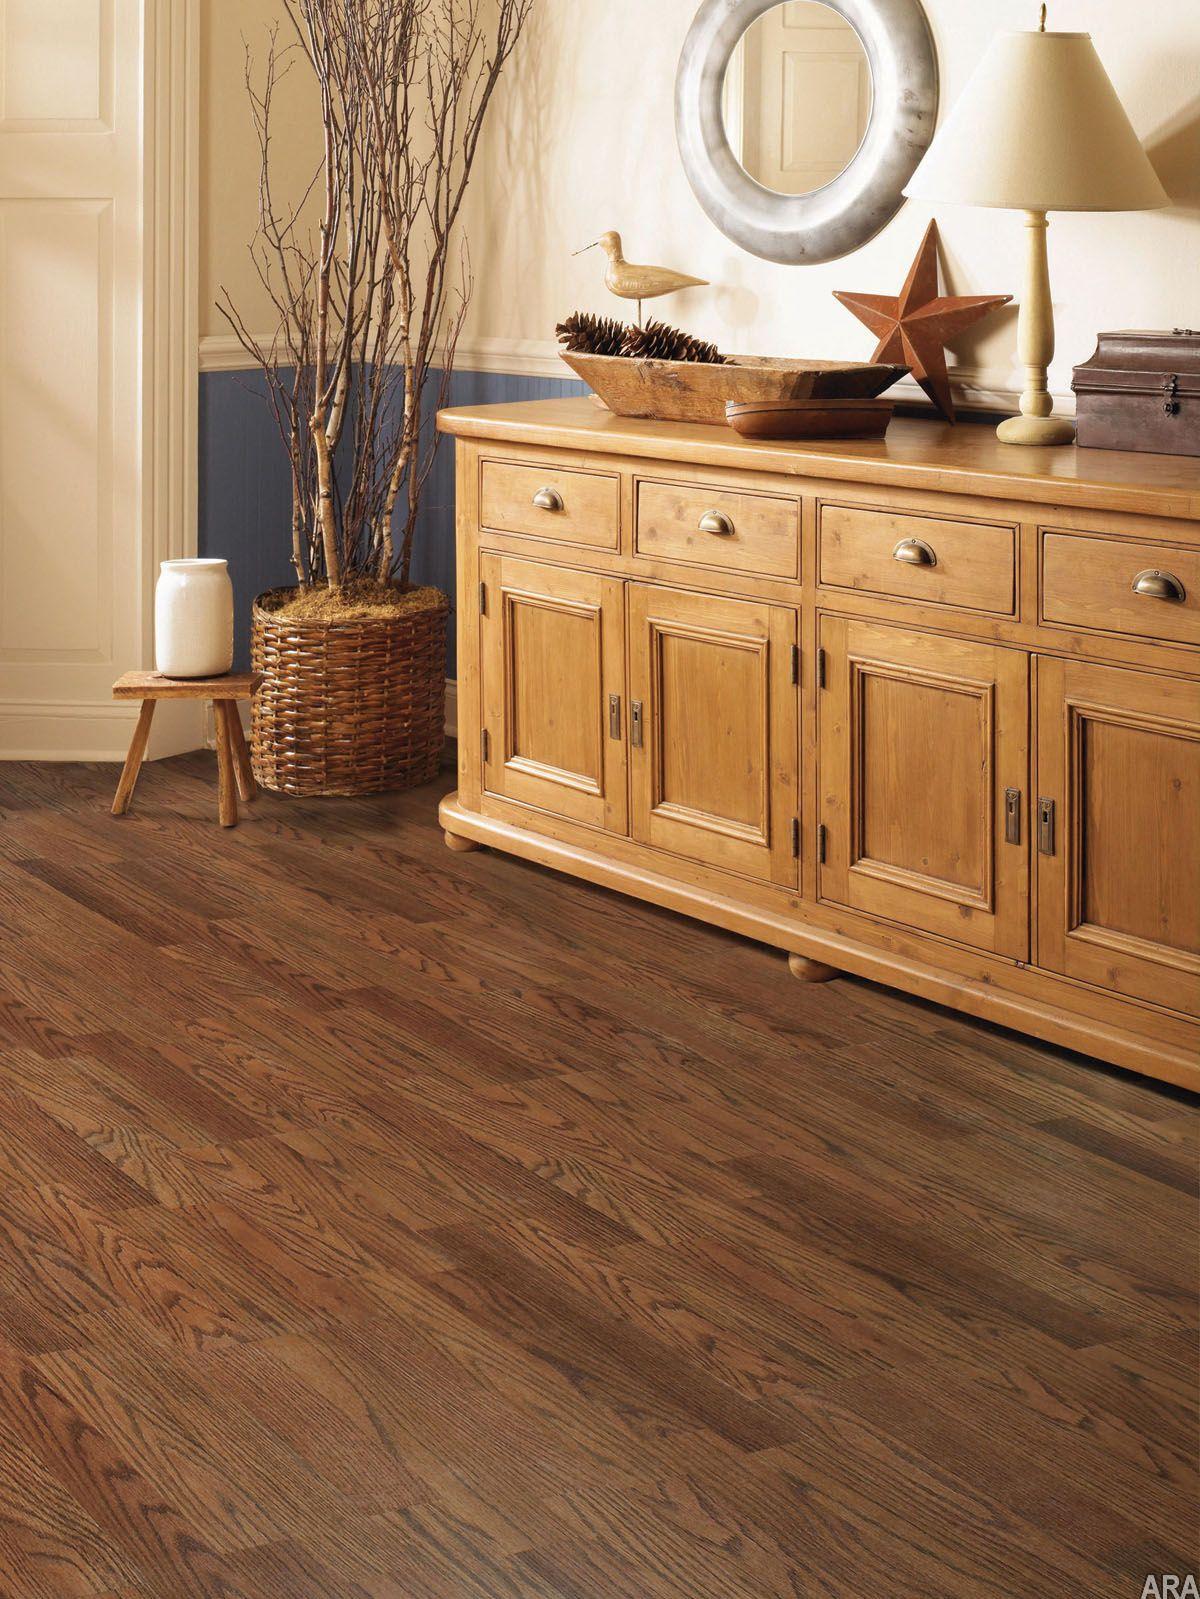 laminate flooring Laminate Flooring Is An Alternative To Real